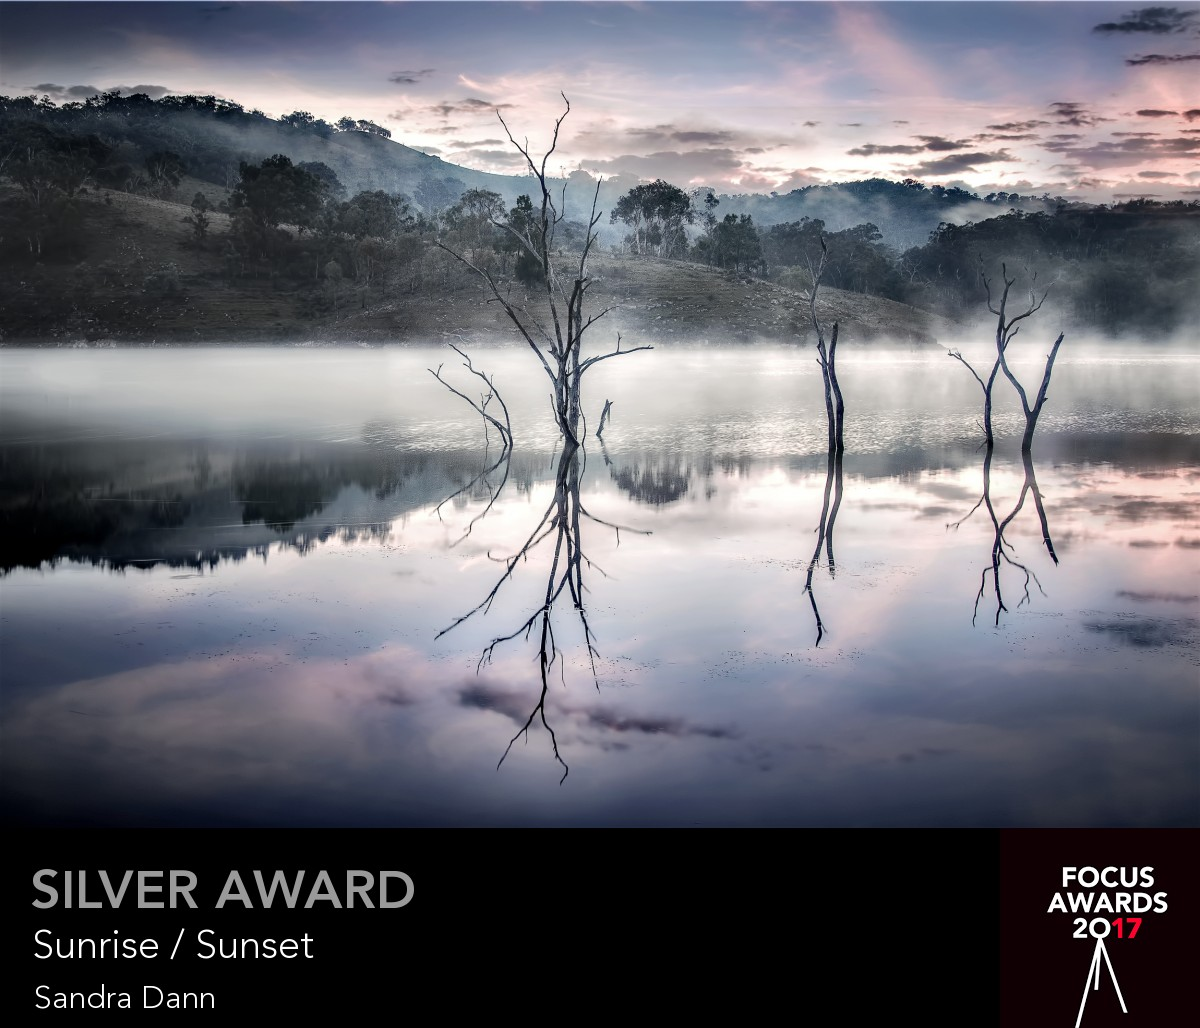 Silver award_7570_7570_7771332287.jpg